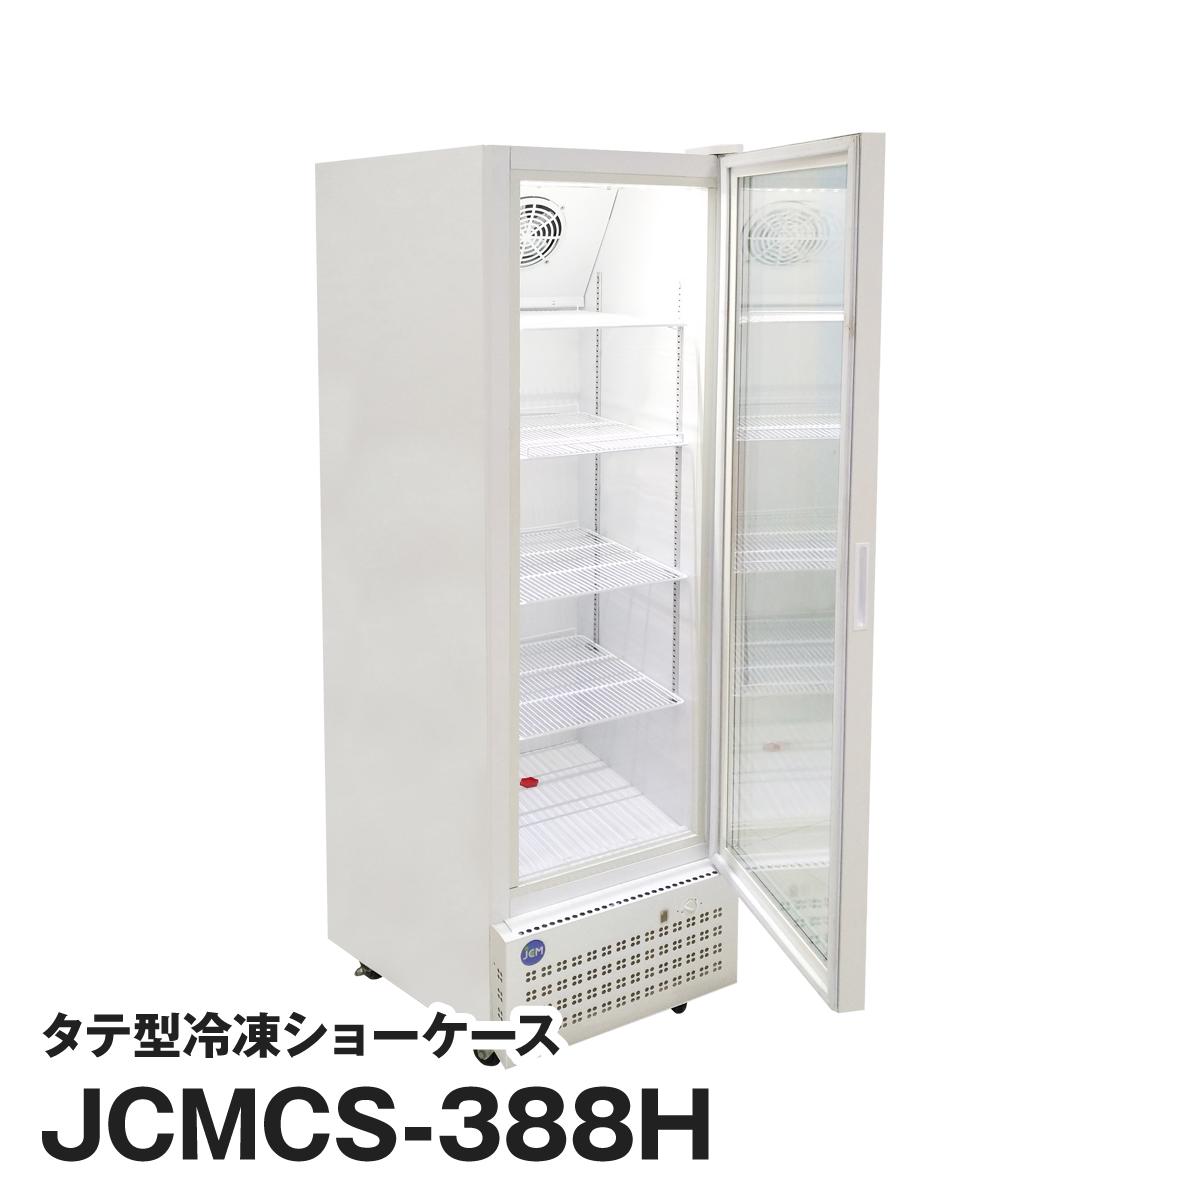 JCM社製 業務用 保冷庫 冷凍庫 388L タテ型冷凍ショーケース JCMCS-388H 新品